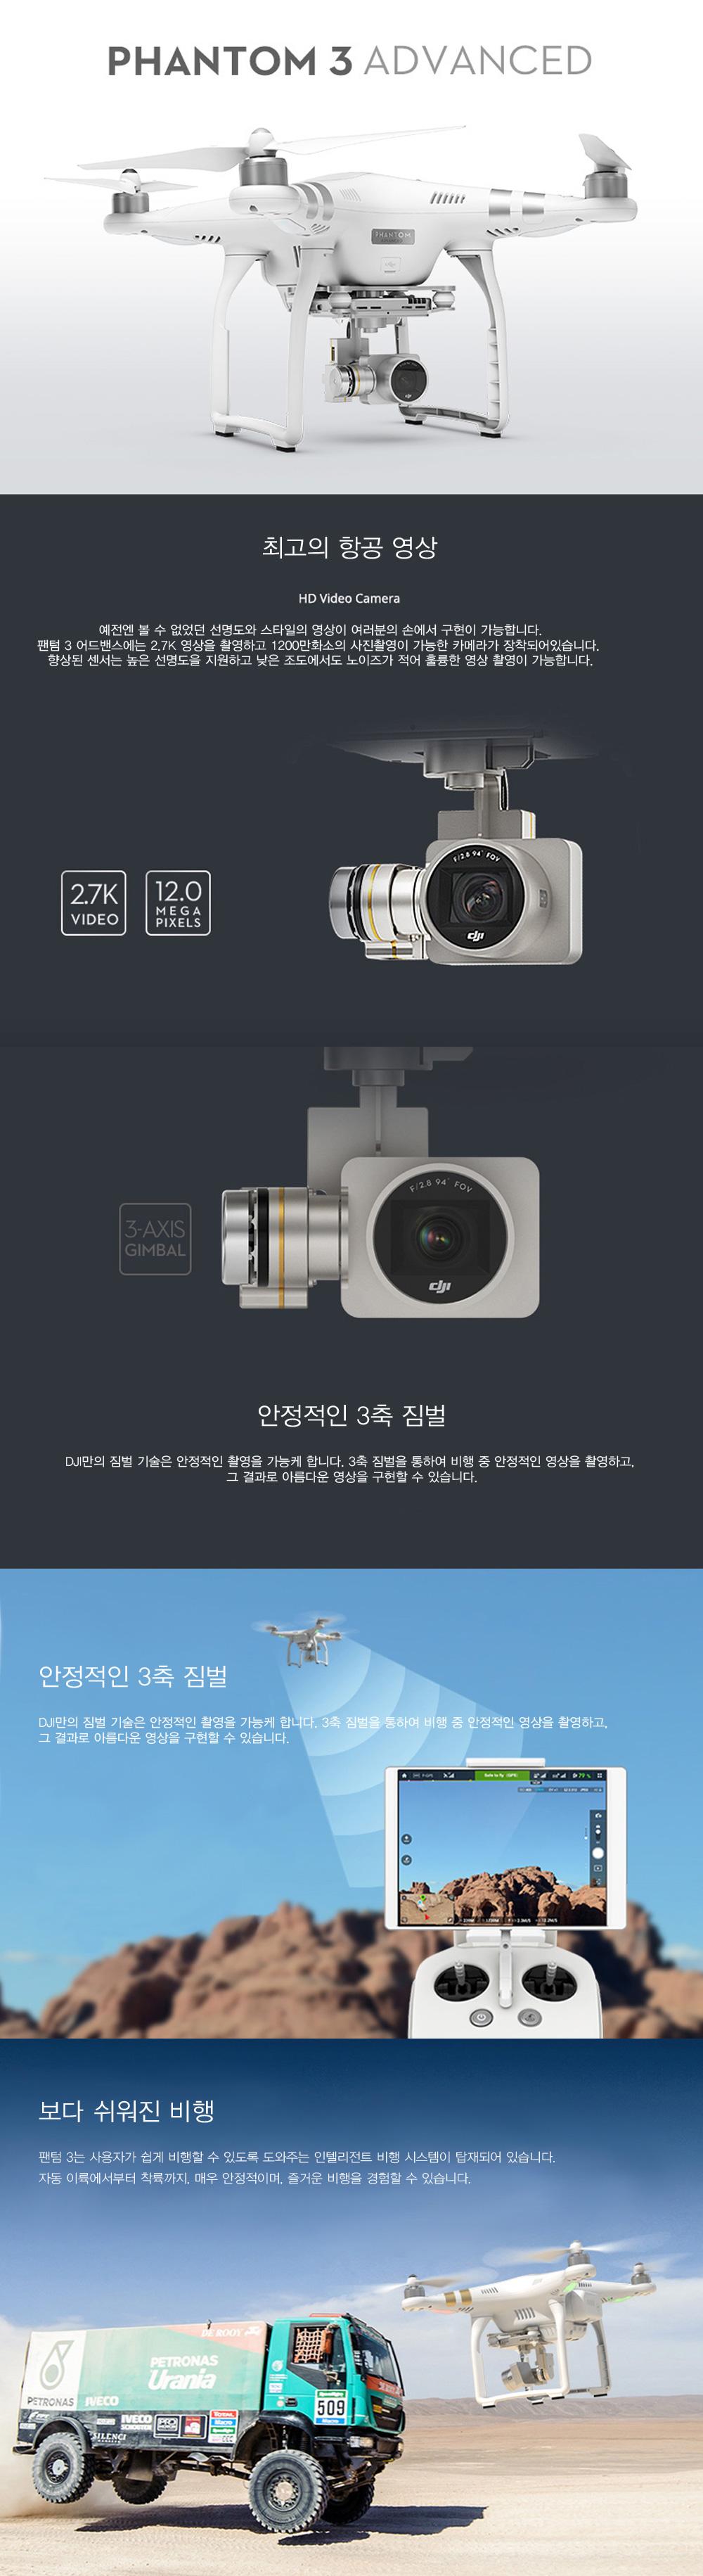 Phantom3, Advance, 드론, Drone, DJI, 제이씨현시스템